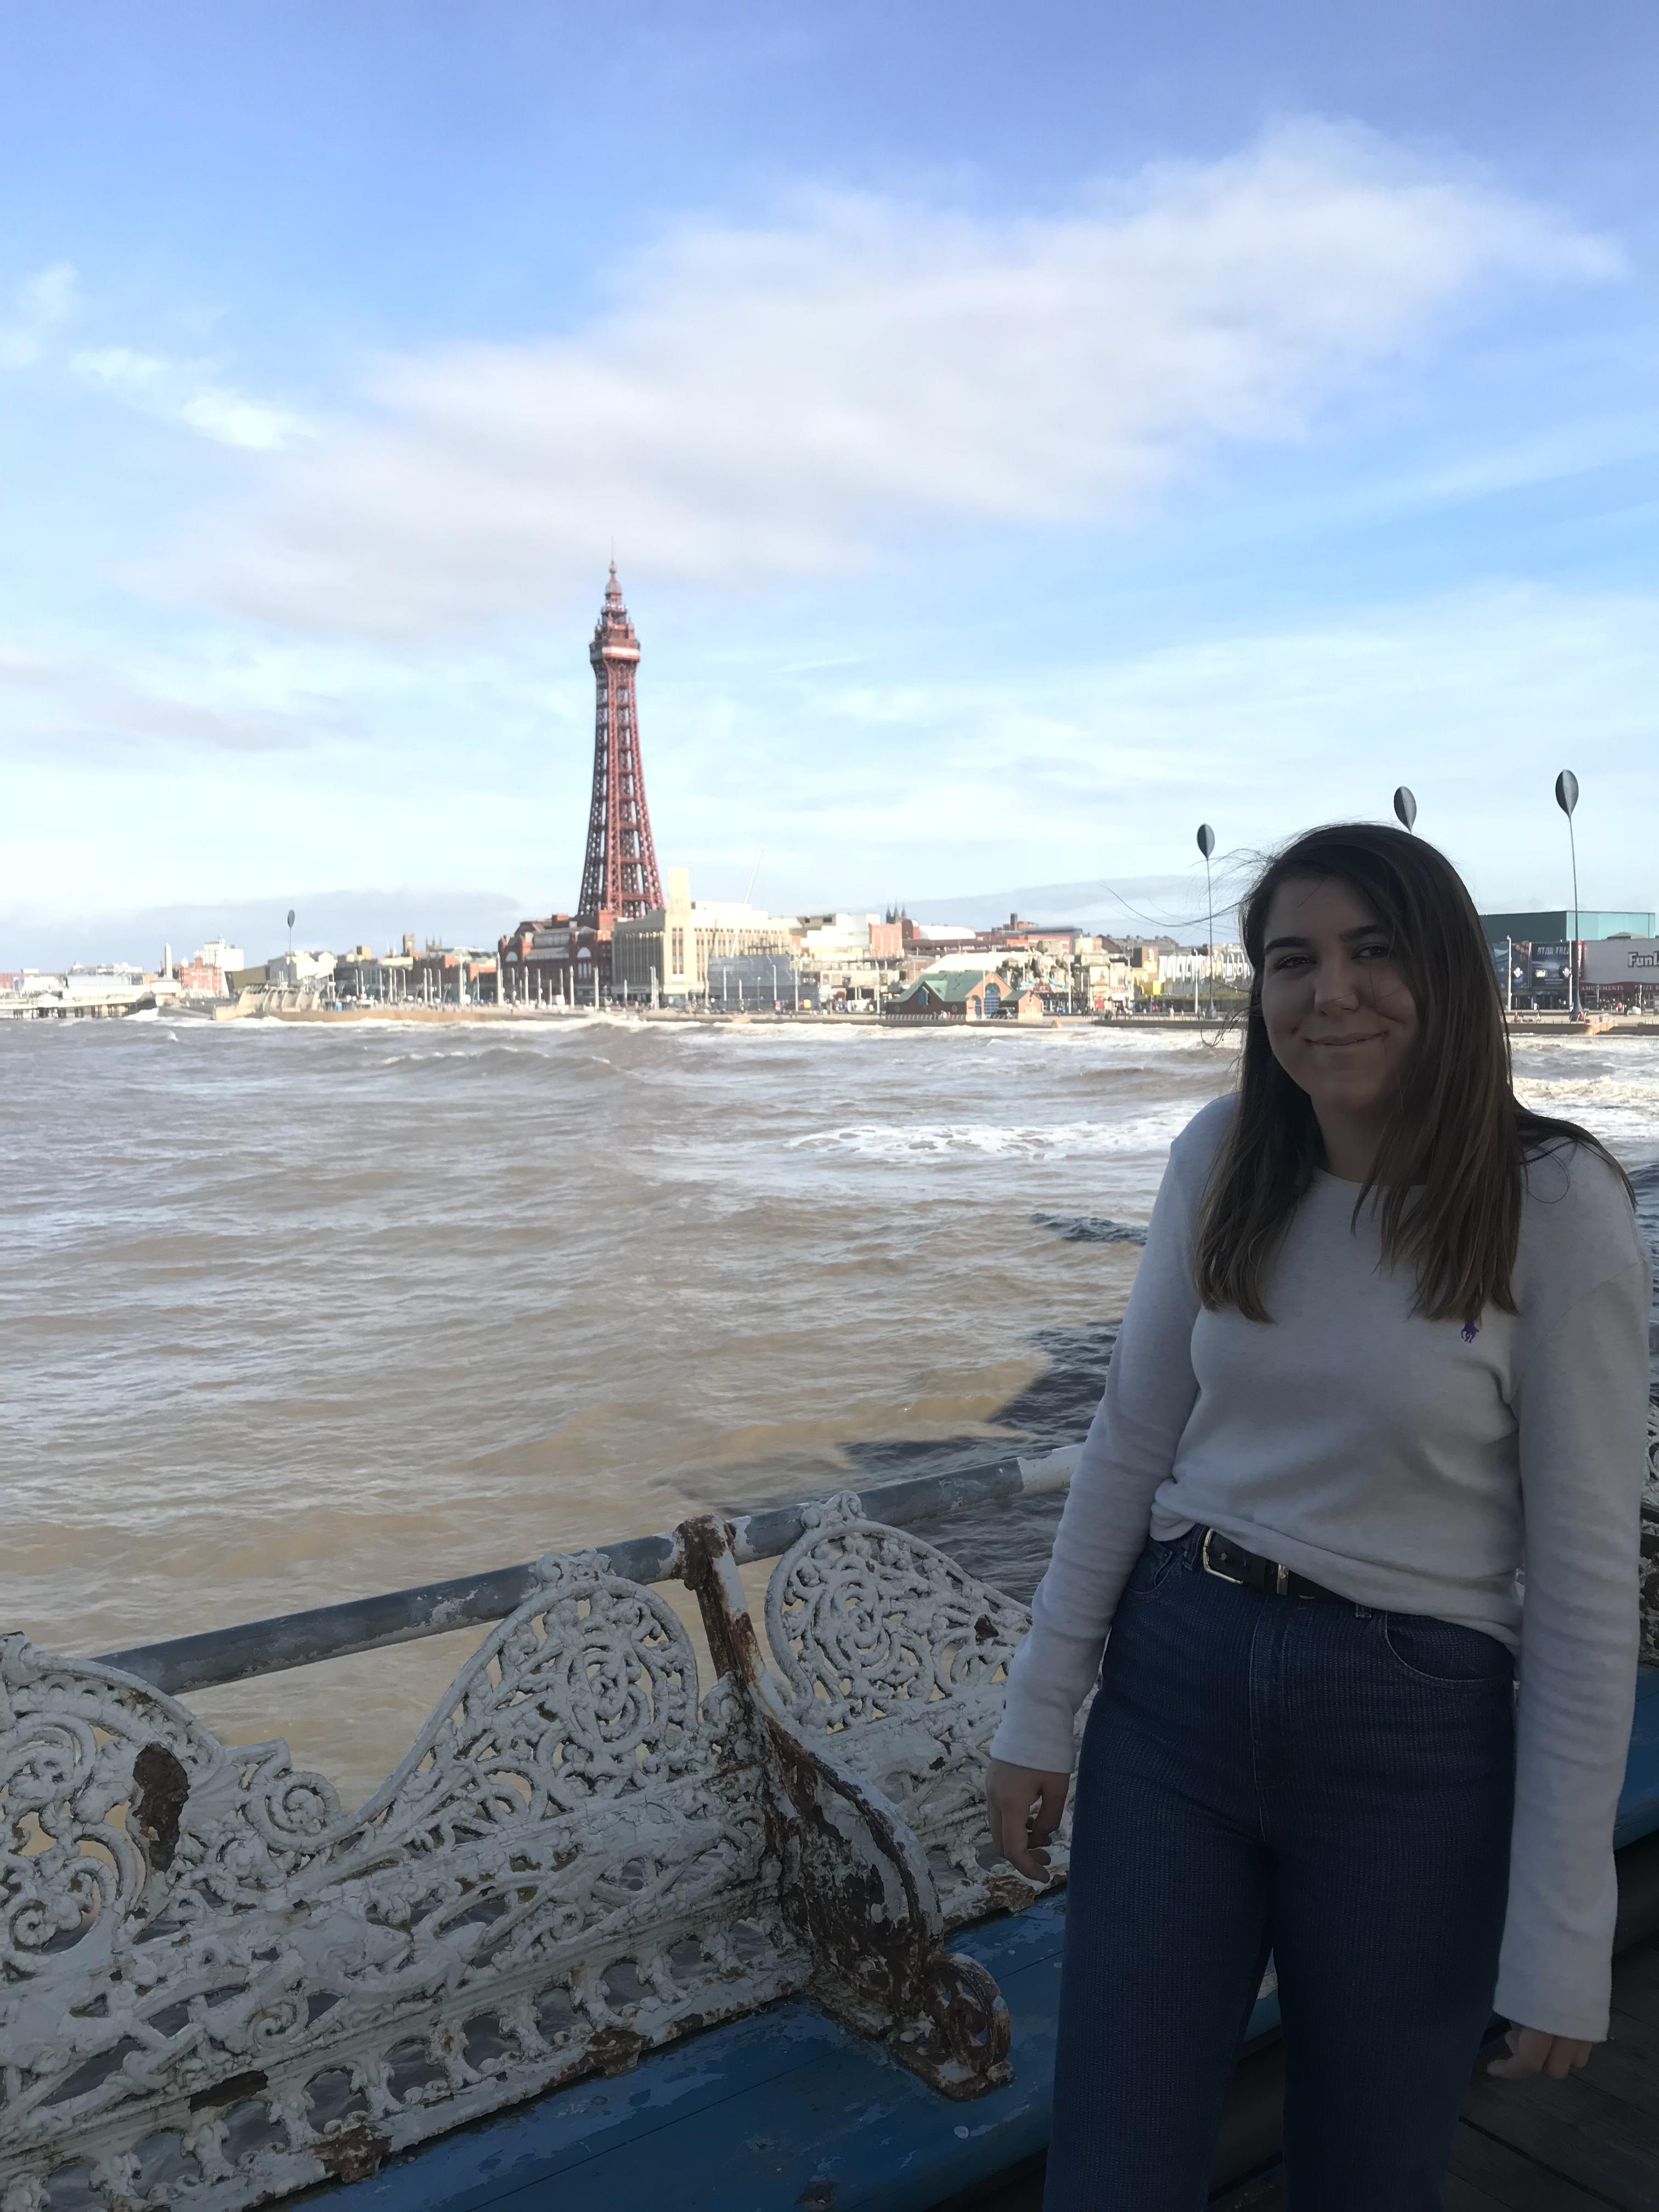 stood on a windy Blackpool pier